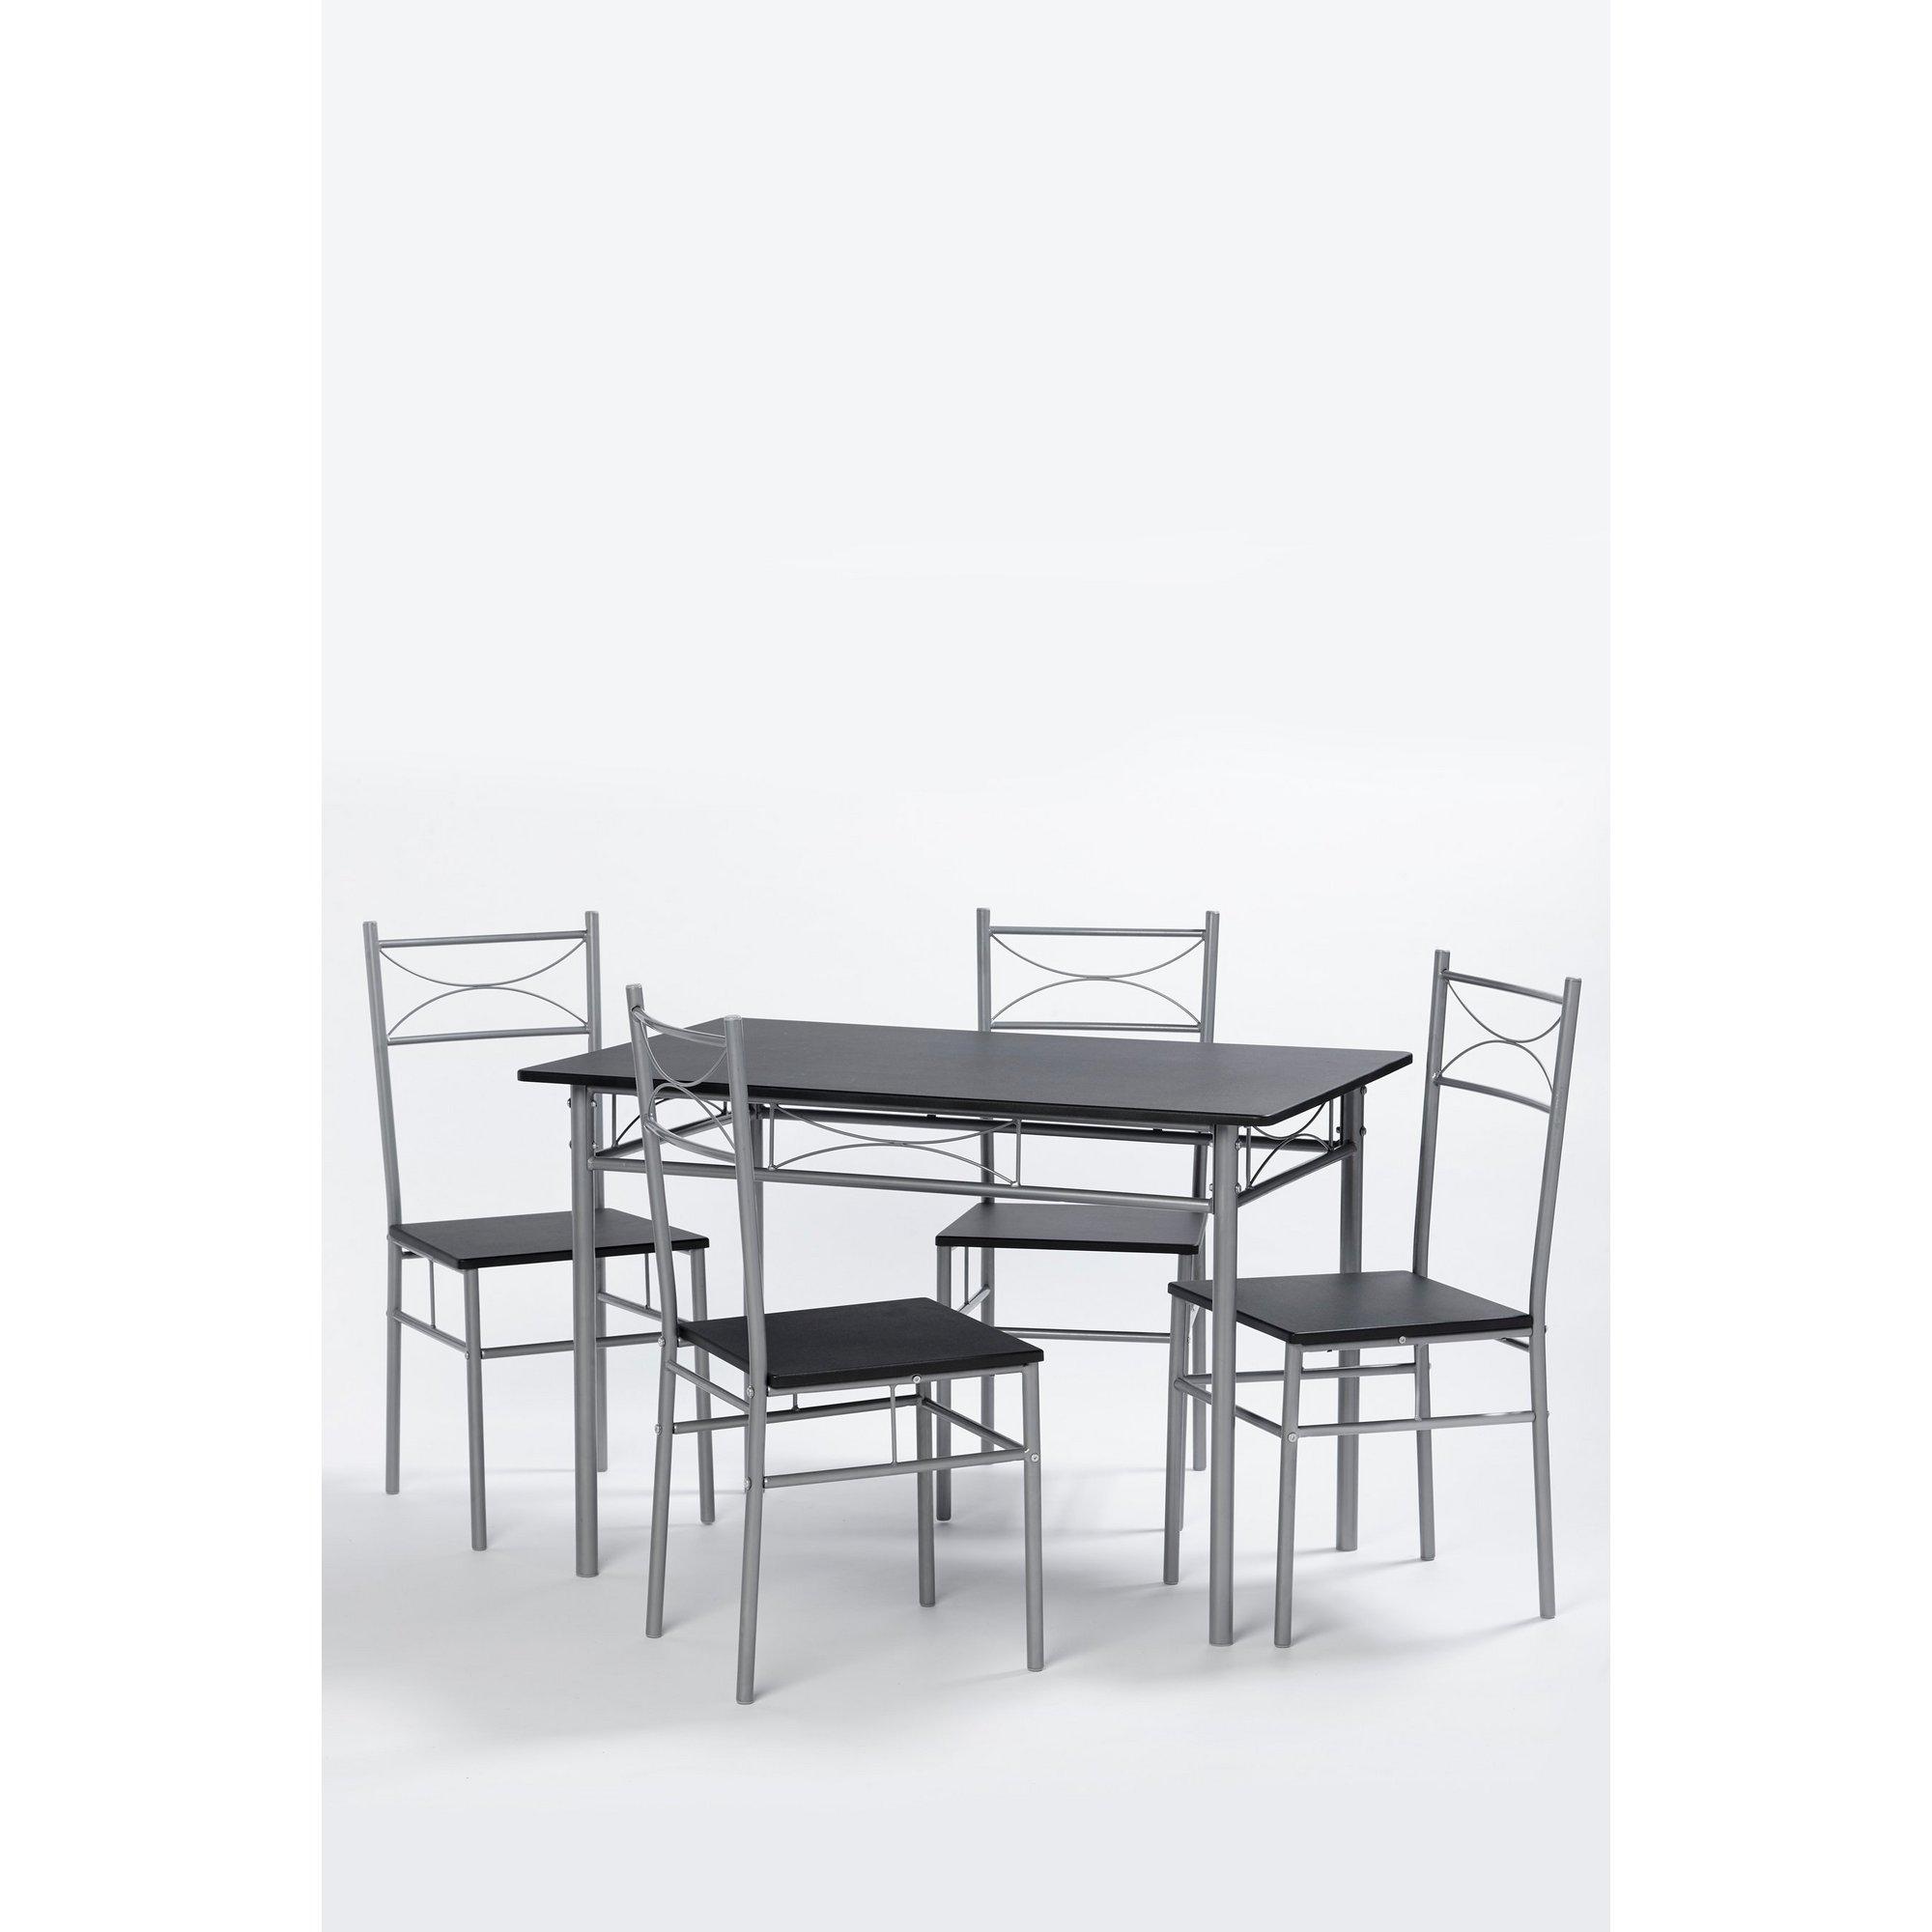 Image of 5-Piece Dining Set